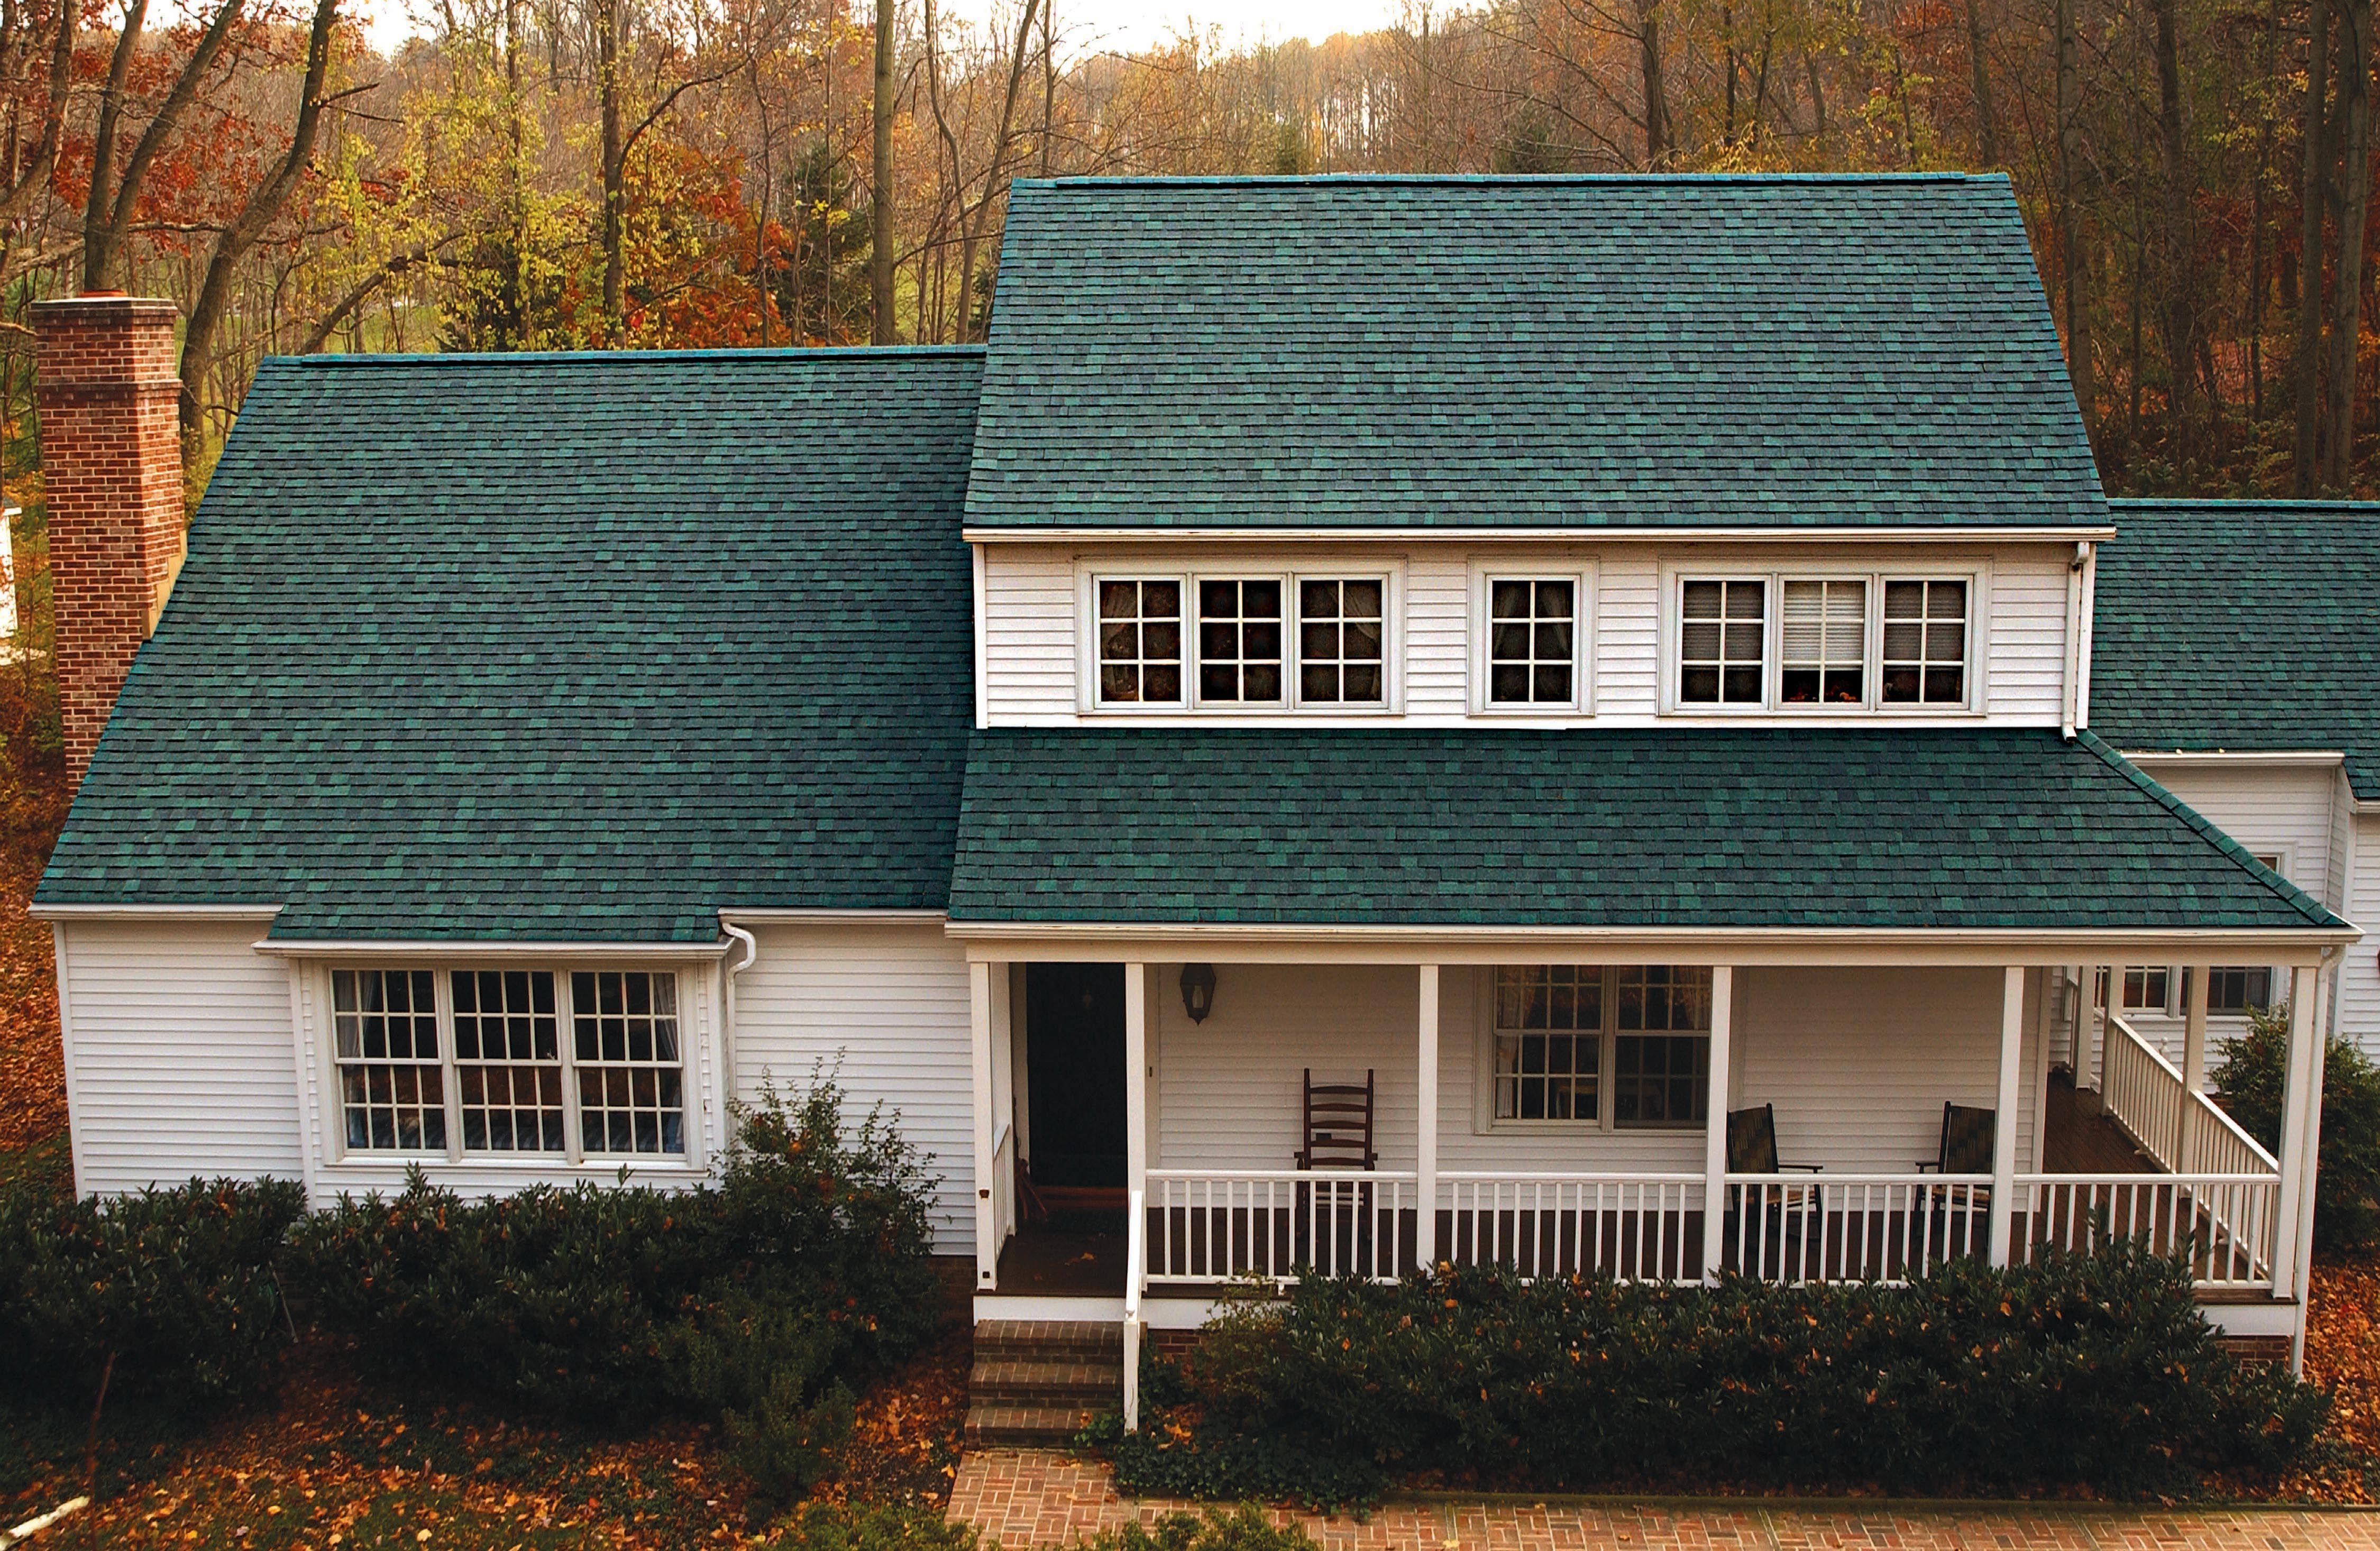 Landmark - Hunter Green Roofing Certainteed